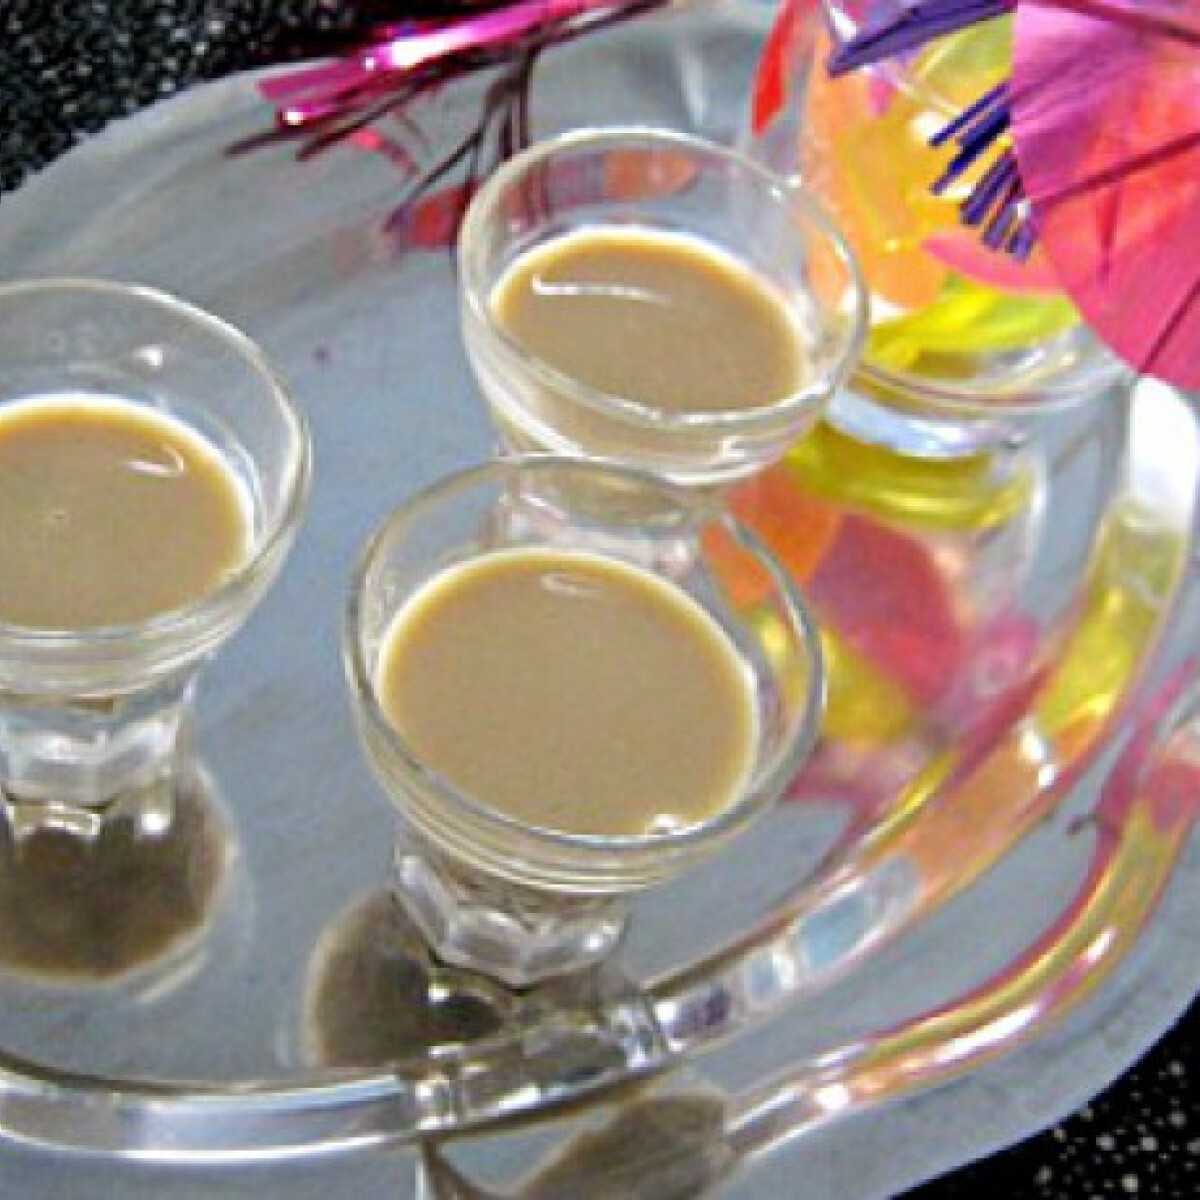 Rumos-kávés likőr